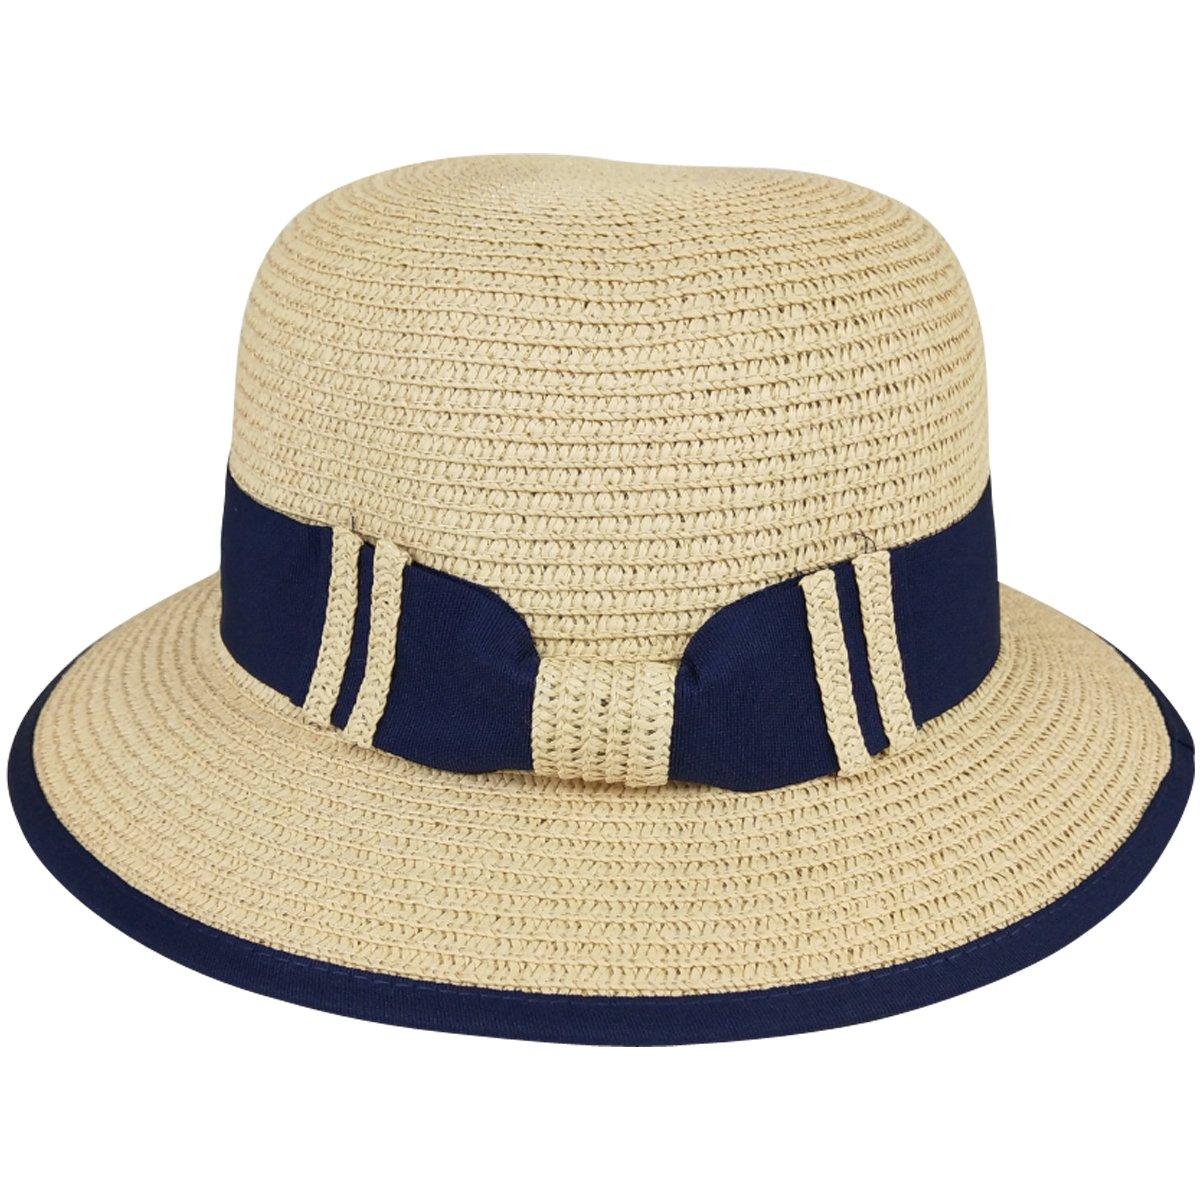 Lanzom Women Wide Brim Straw Foldable Roll up Cap Fedora Beach Sun Hat  UPF50+ (A-Beige) at Amazon Women s Clothing store  4be833eef690